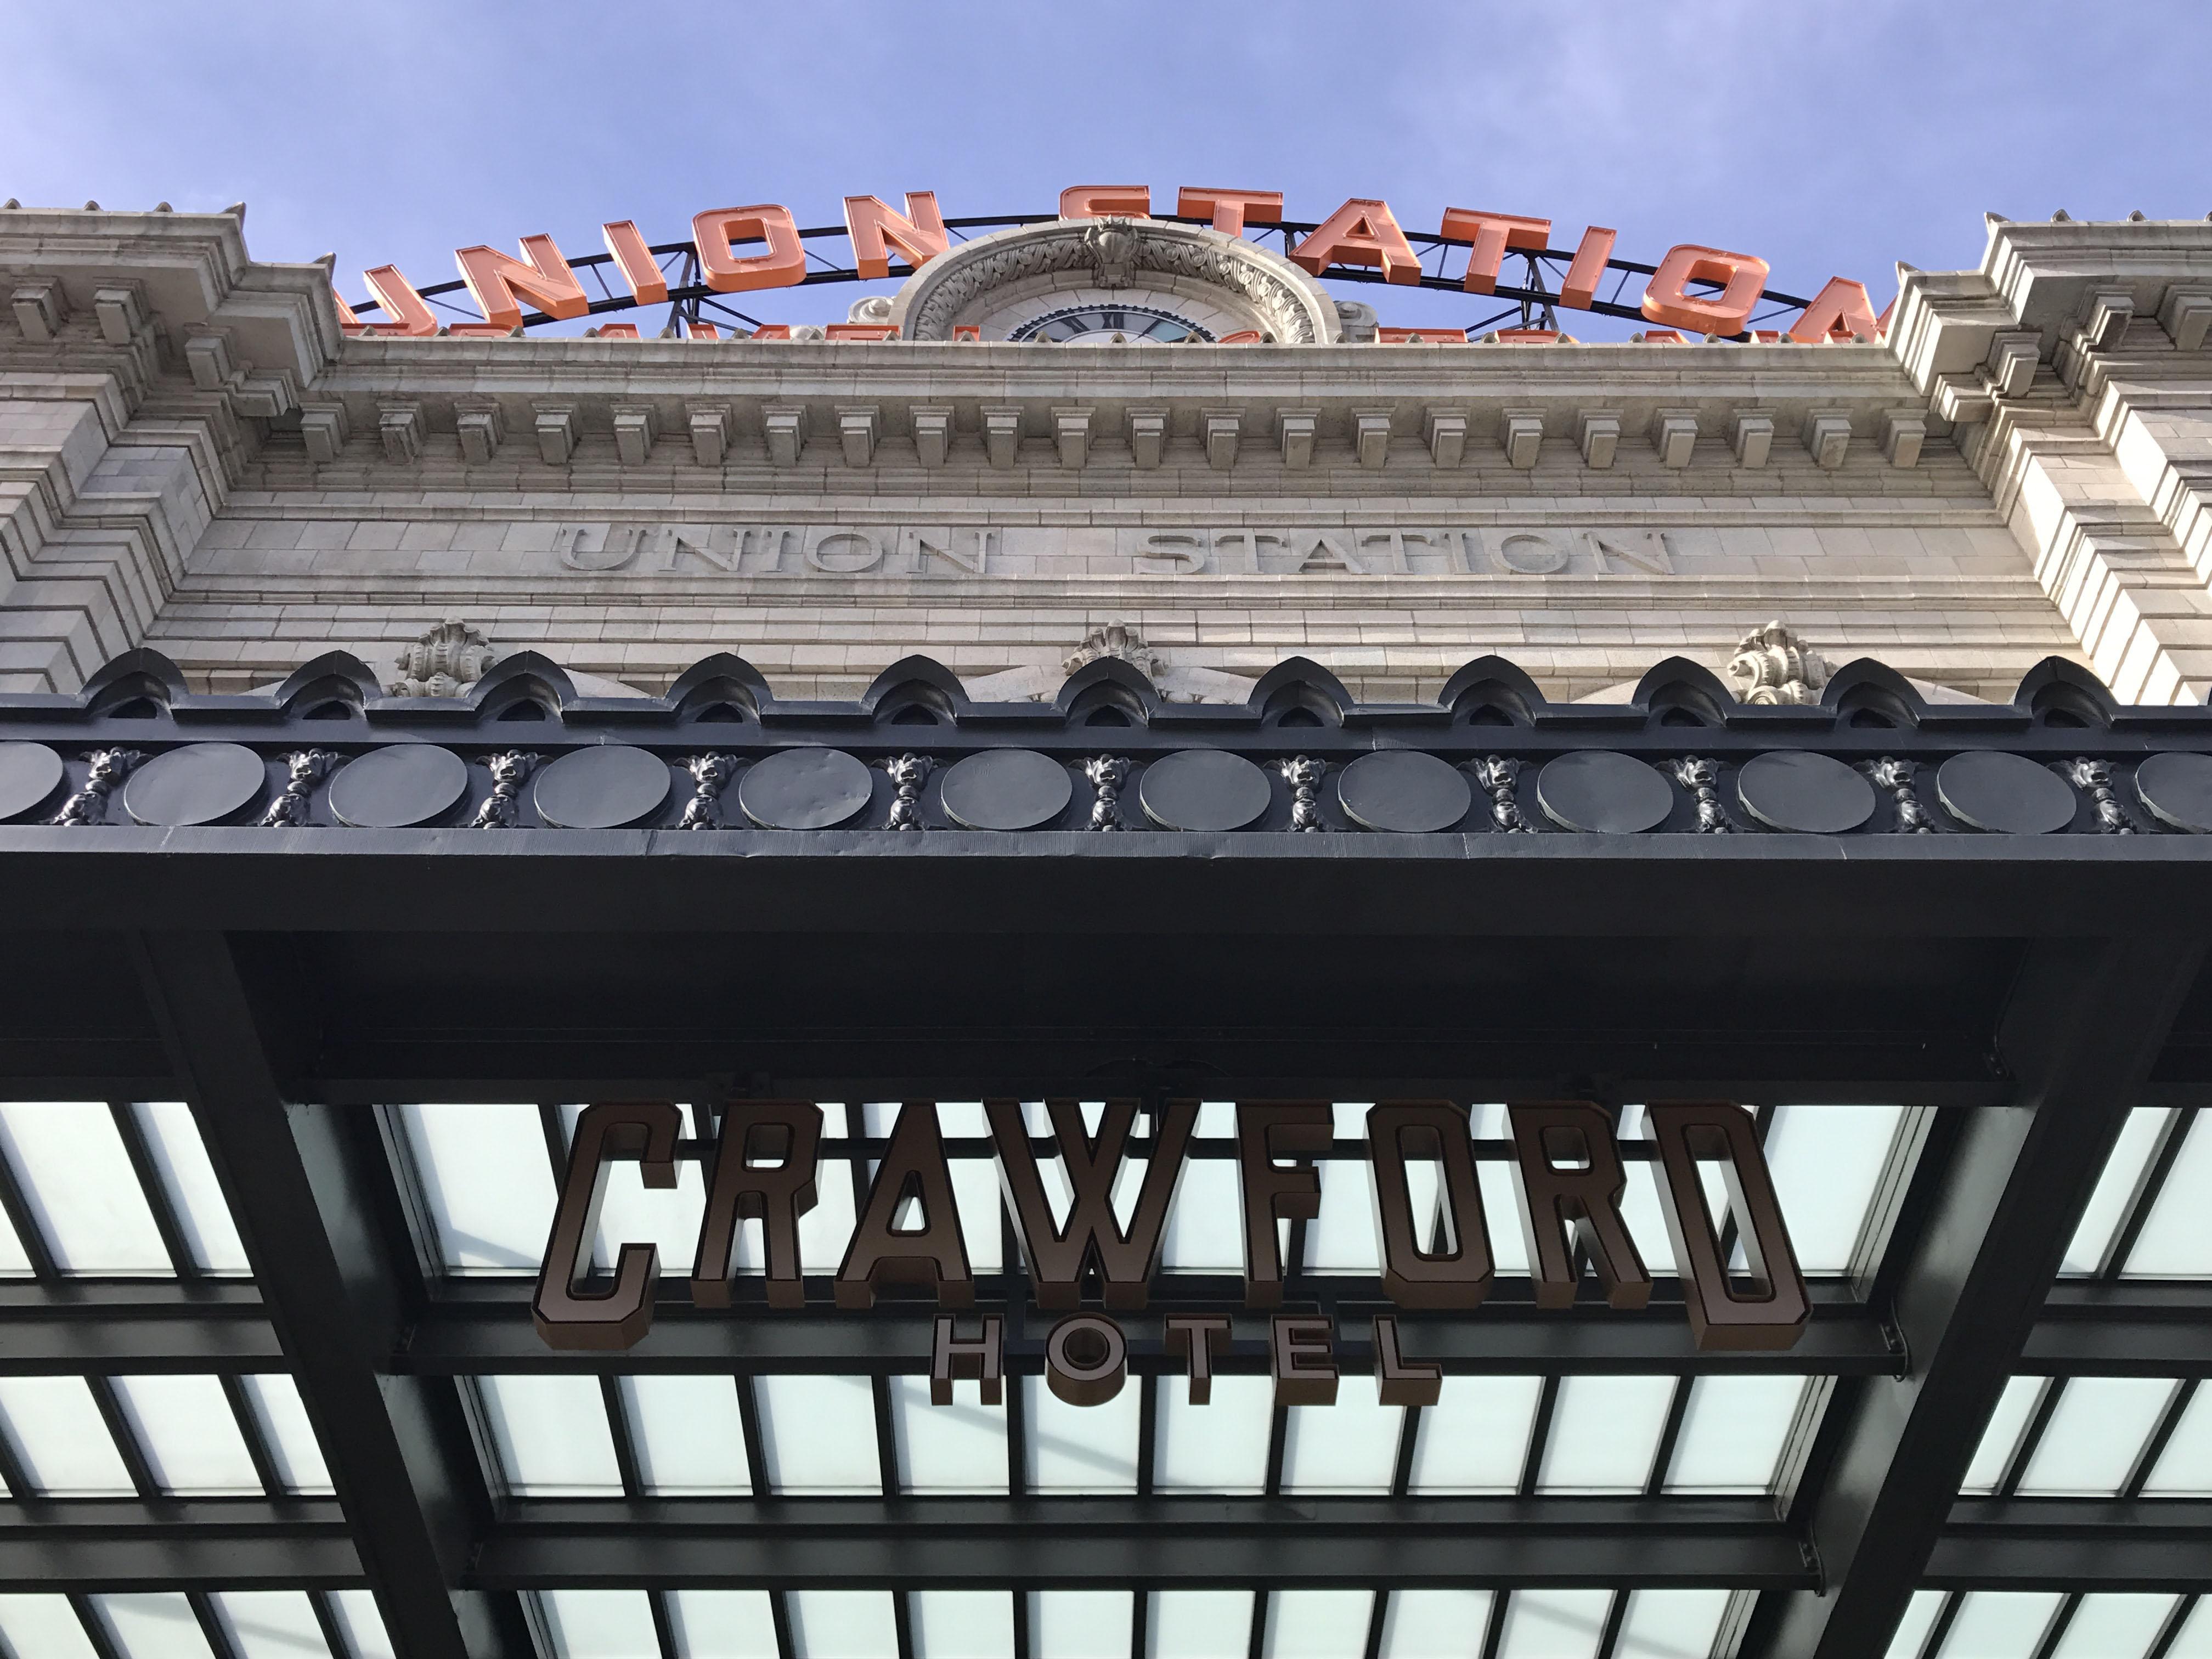 Crawford Hotel Exterior Sign